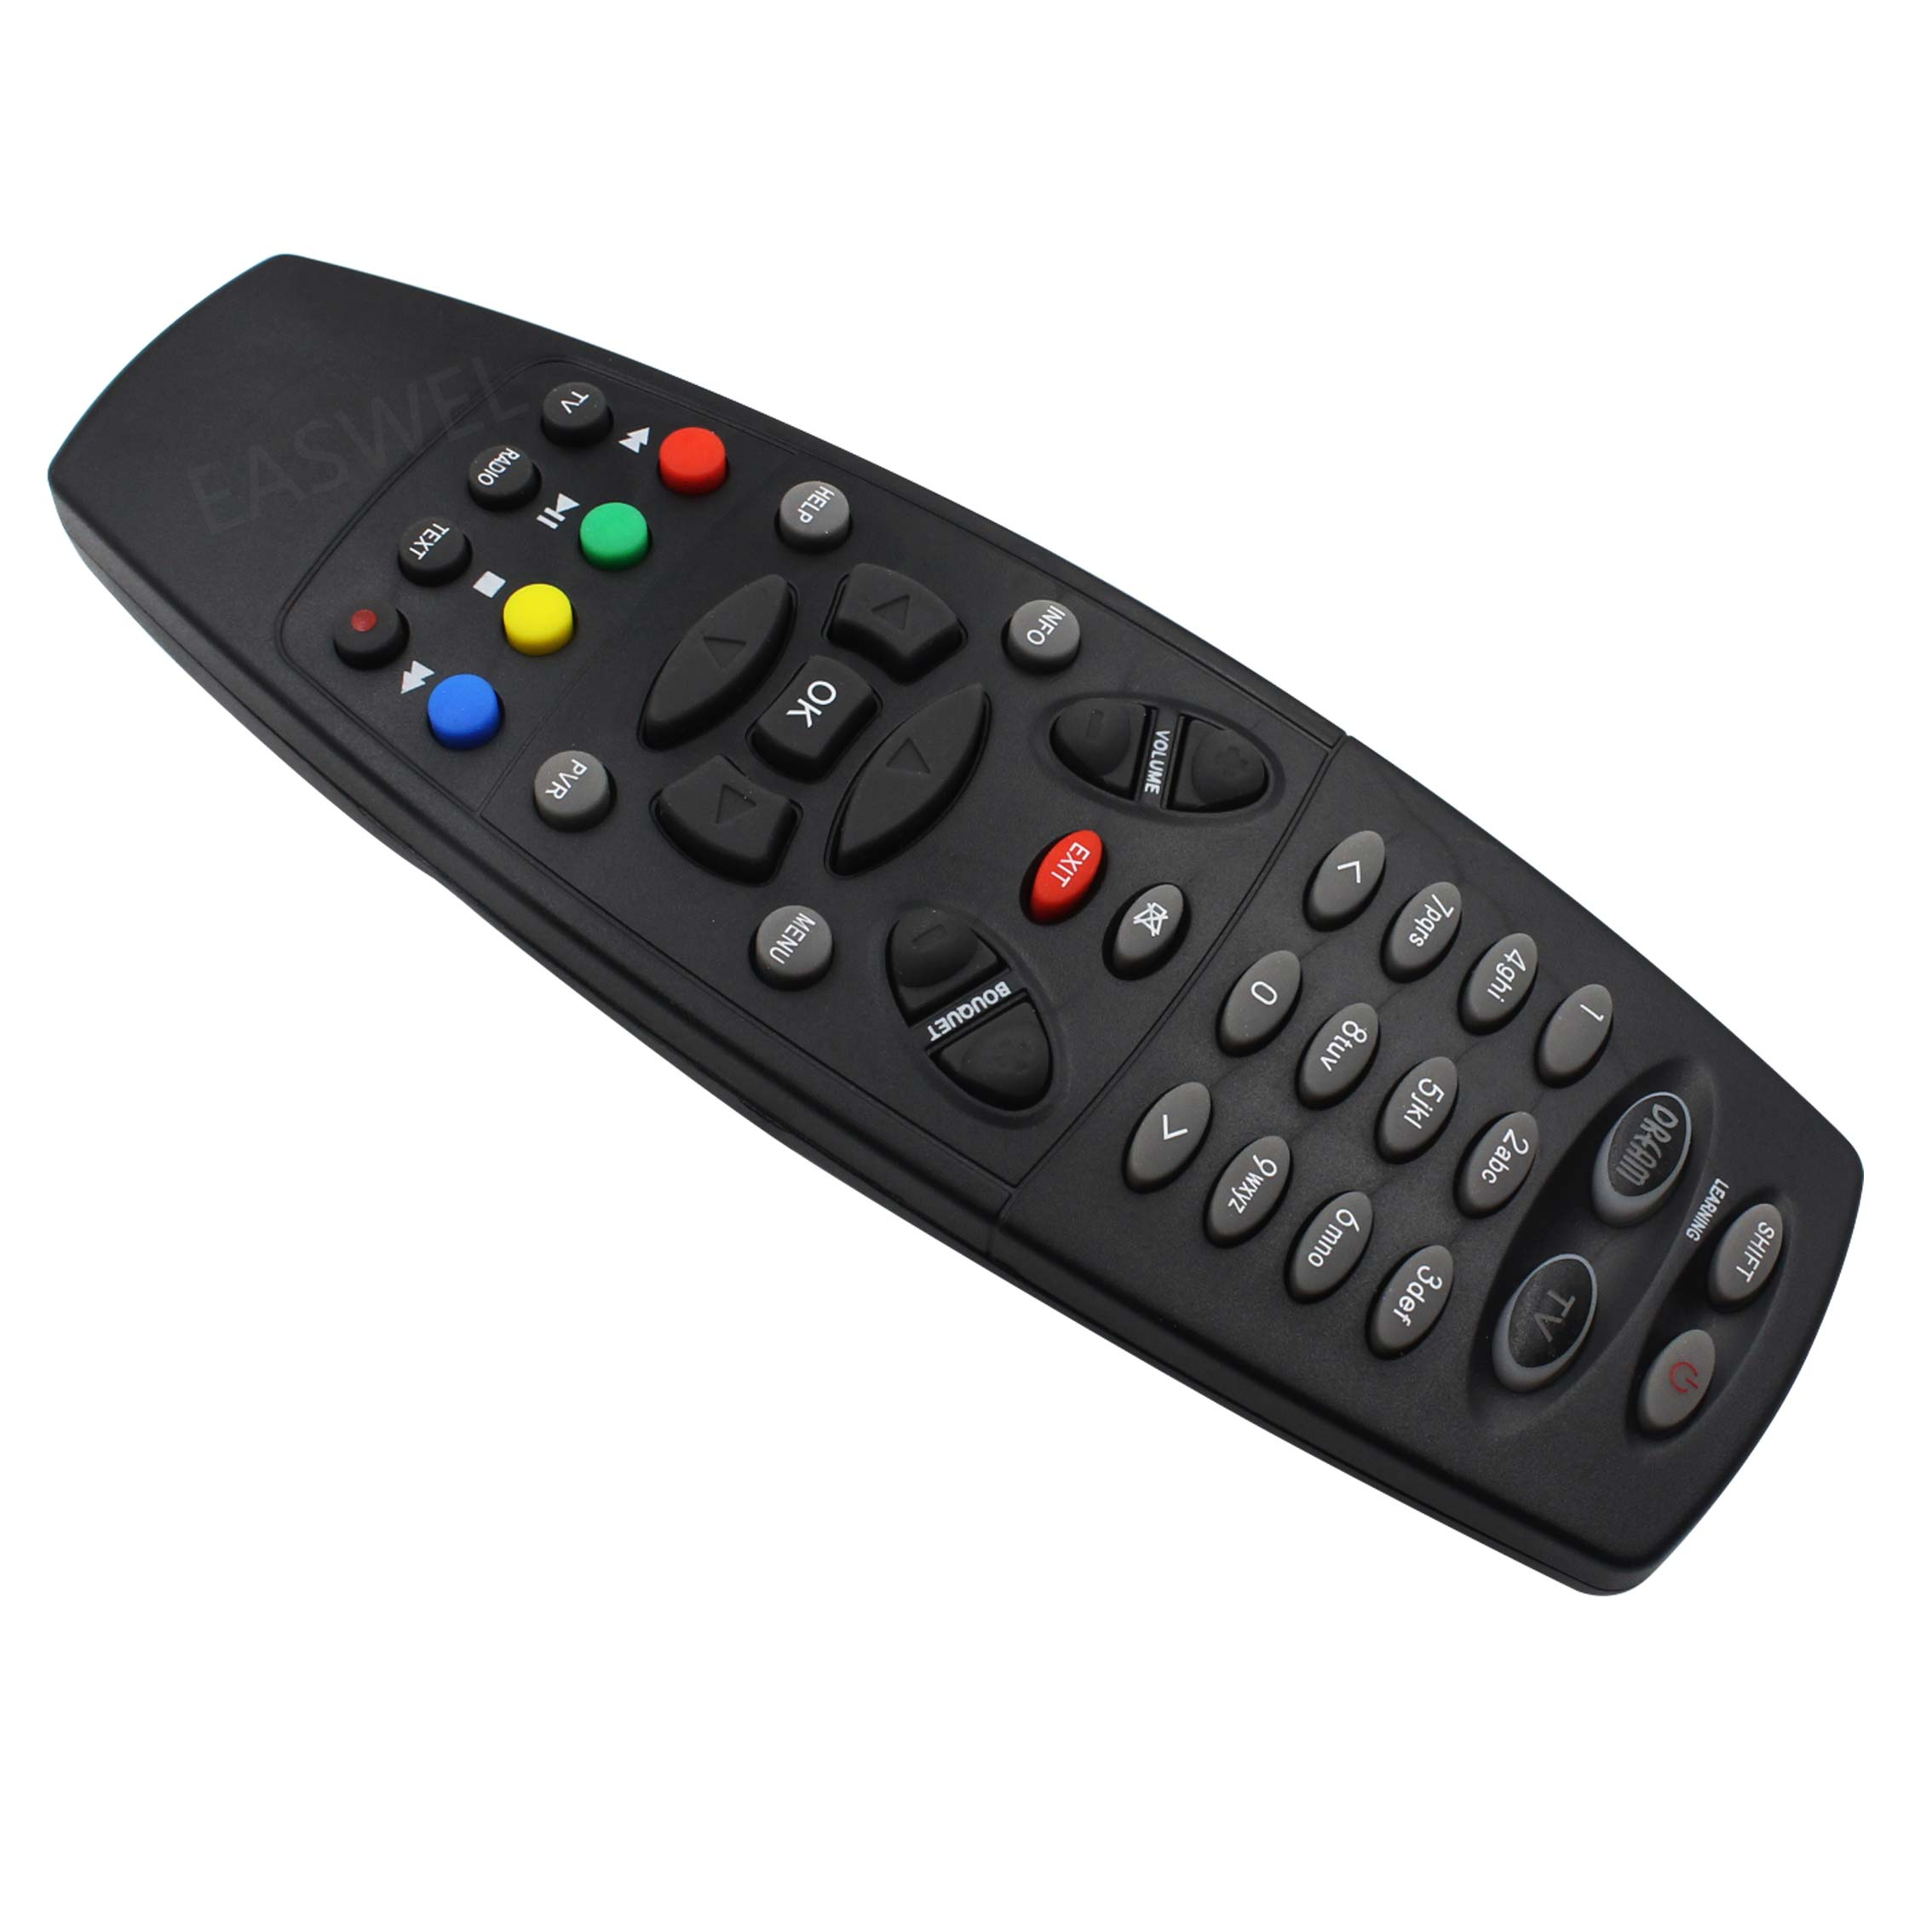 Vervanging Afstandsbediening Controller Voor Dreambox DM800 DM800HD DM800SE 500HD